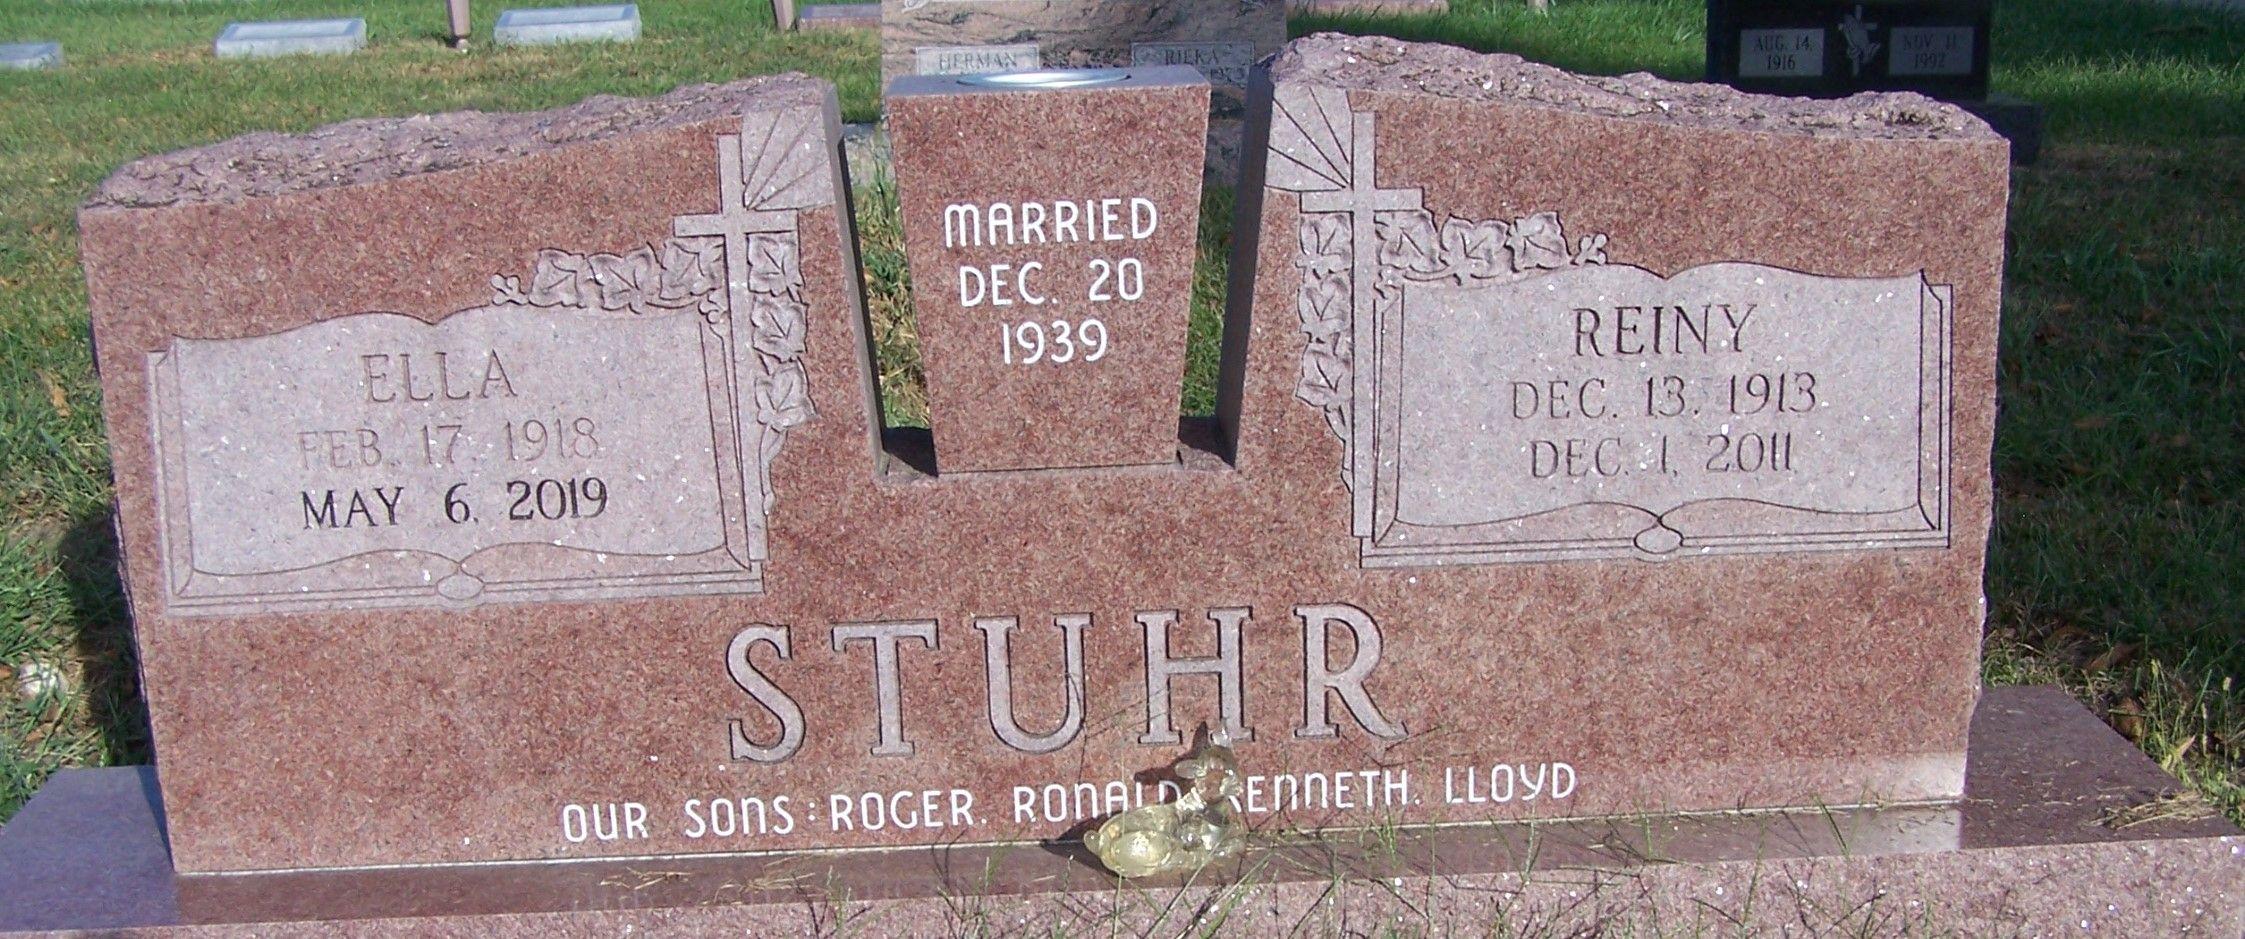 Ella Sophia Anna Wellman Stuhr 1918 2019 Find A Grave Memorial Images, Photos, Reviews